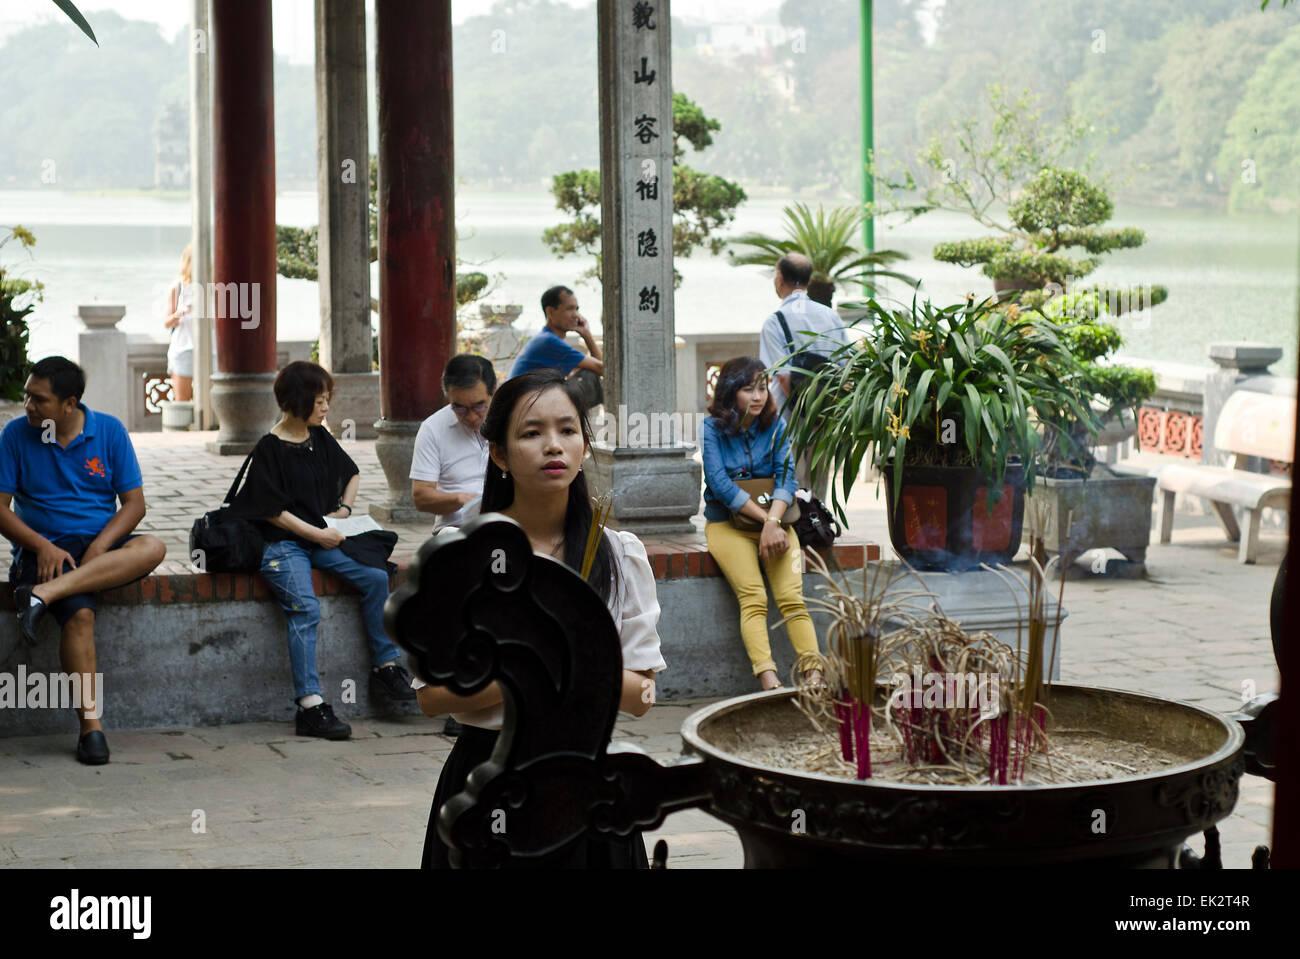 Ngoc Son Temple in the Hoan Kiem Lake. Hanoi, Vietnam. - Stock Image